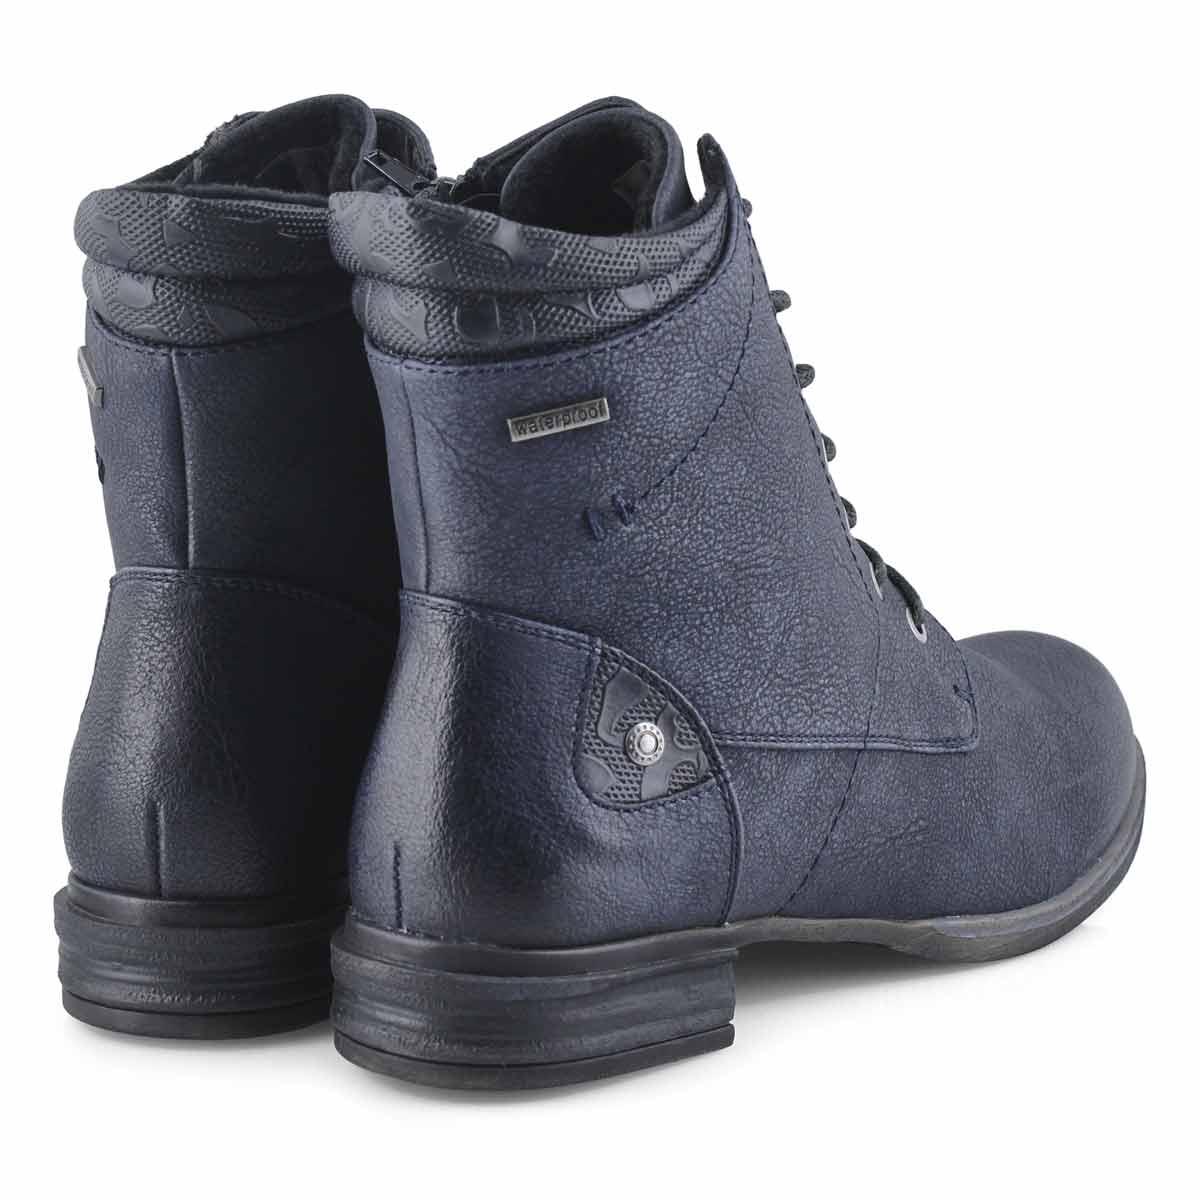 Bottes militaires VENUS 34, bleu marine, femmes